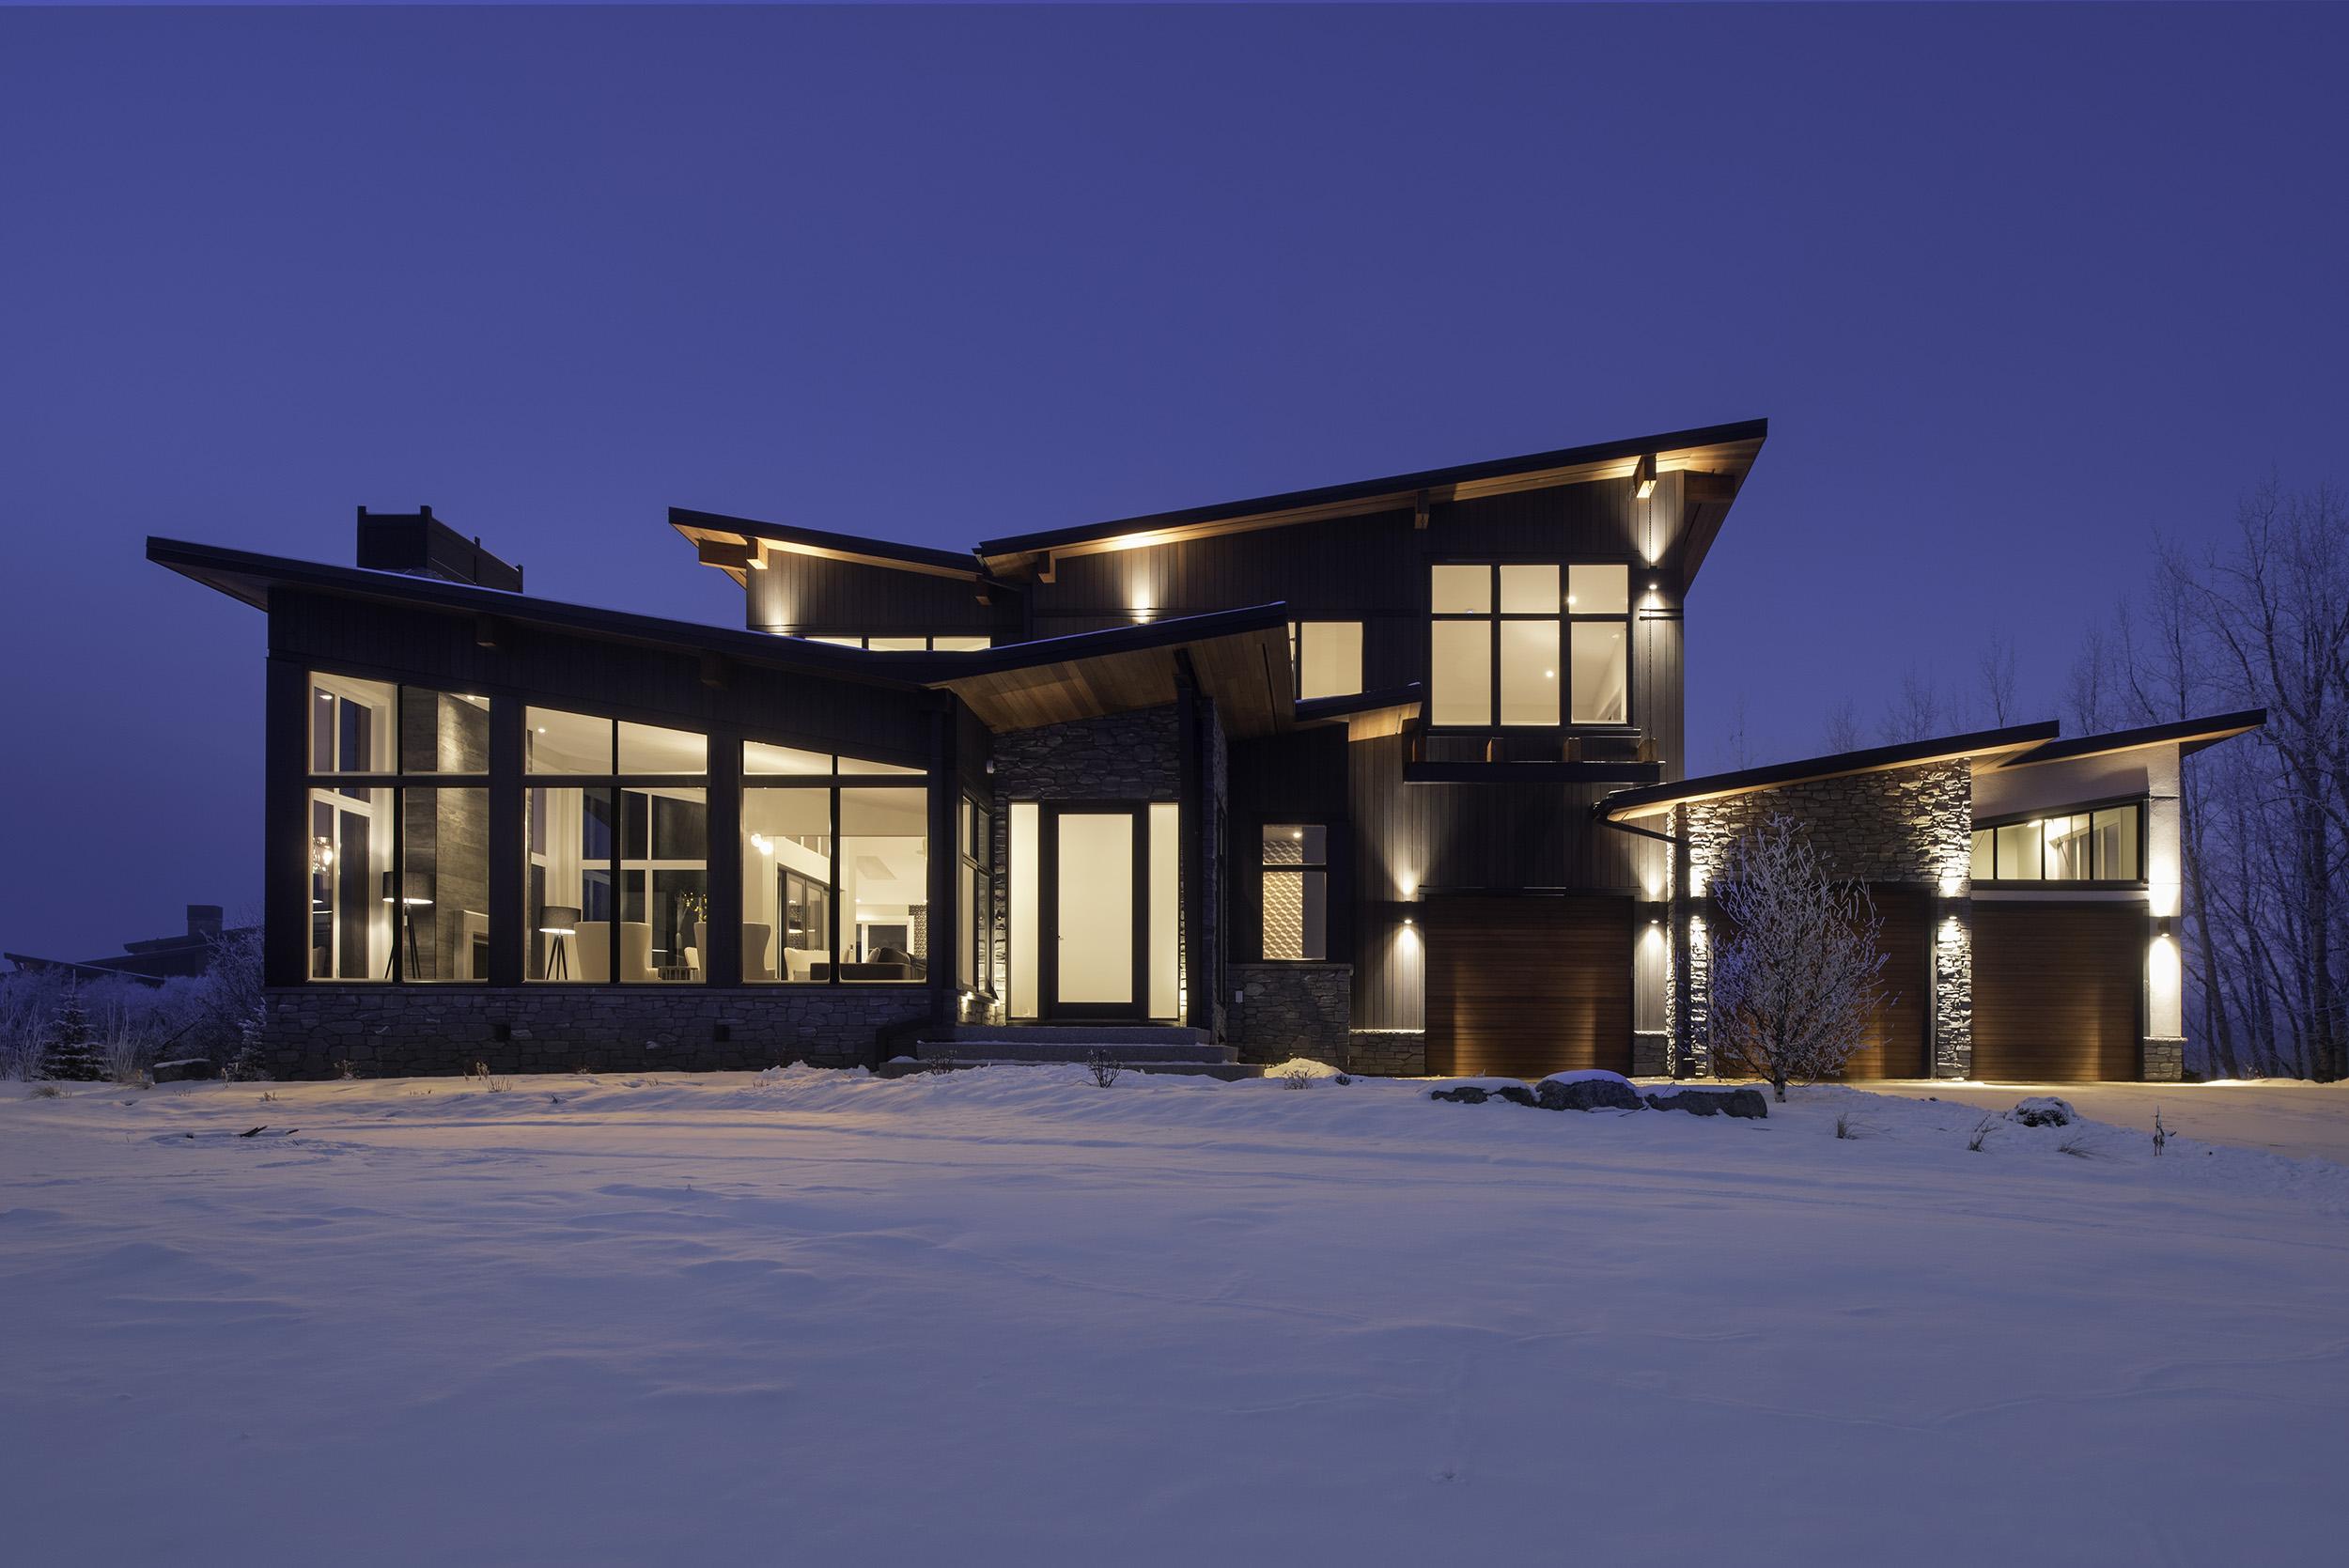 Architecture Photography Calgary.jpg